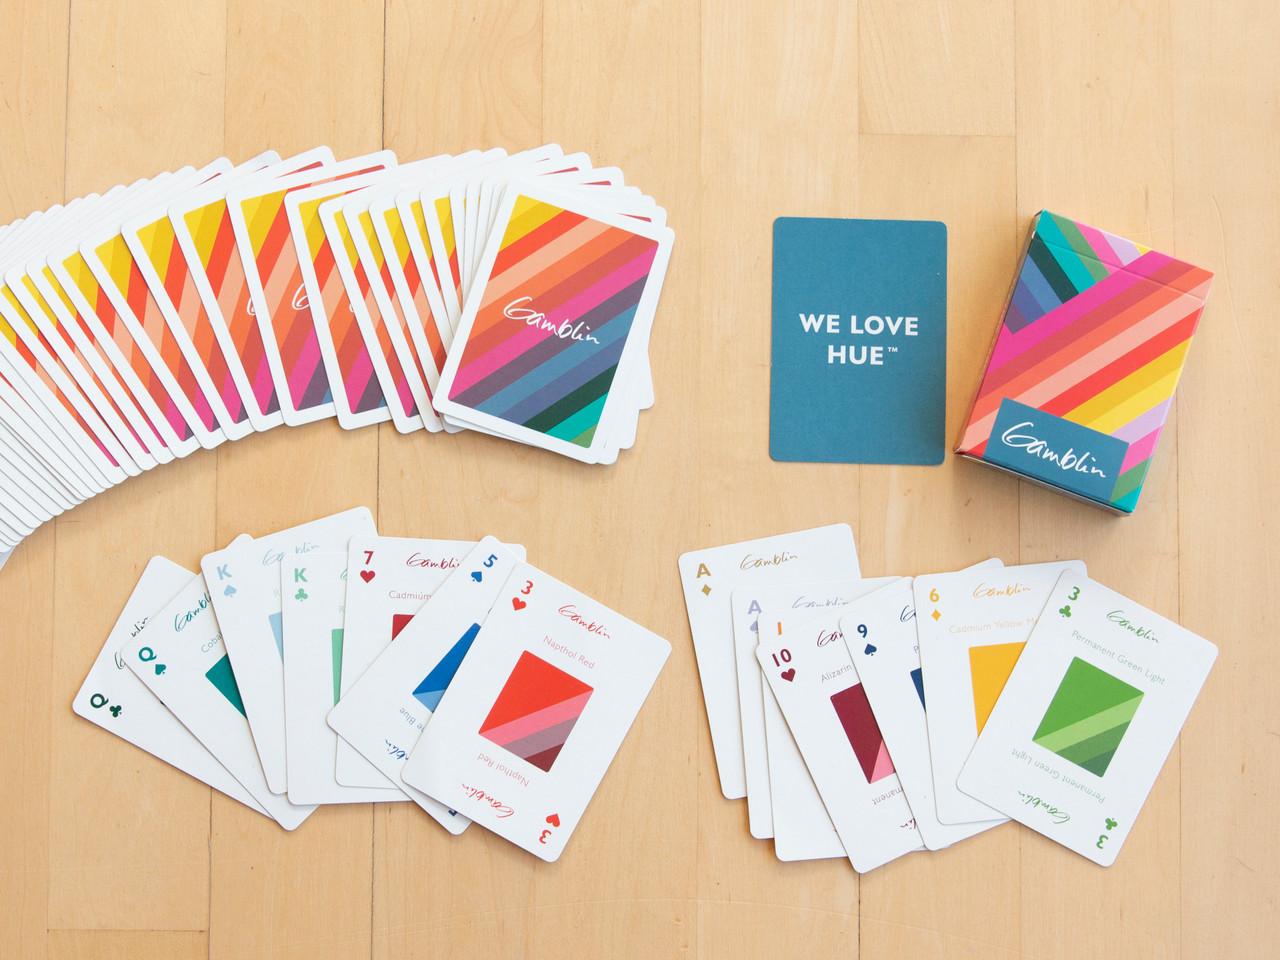 Gamblin 52-card deck with oil paint colors on each card